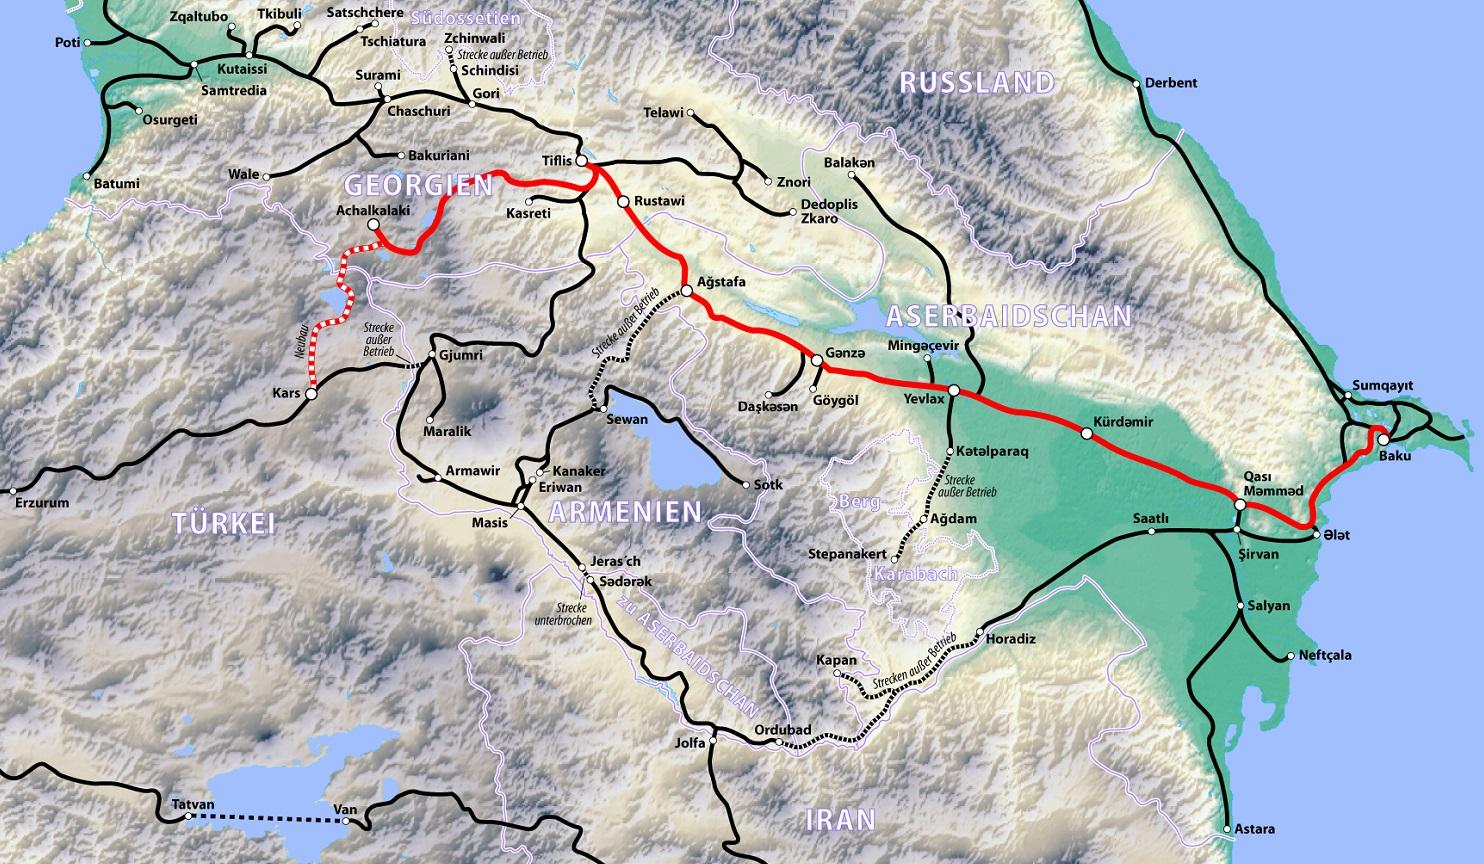 http://cfts.org.ua/imglib/_newimage/articles/kavkazskoe_okno_v_evropu_8_faktov_o_zh_d_magistrali_baku__tbilisi__kars_1302/95290/95291/1100.jpg